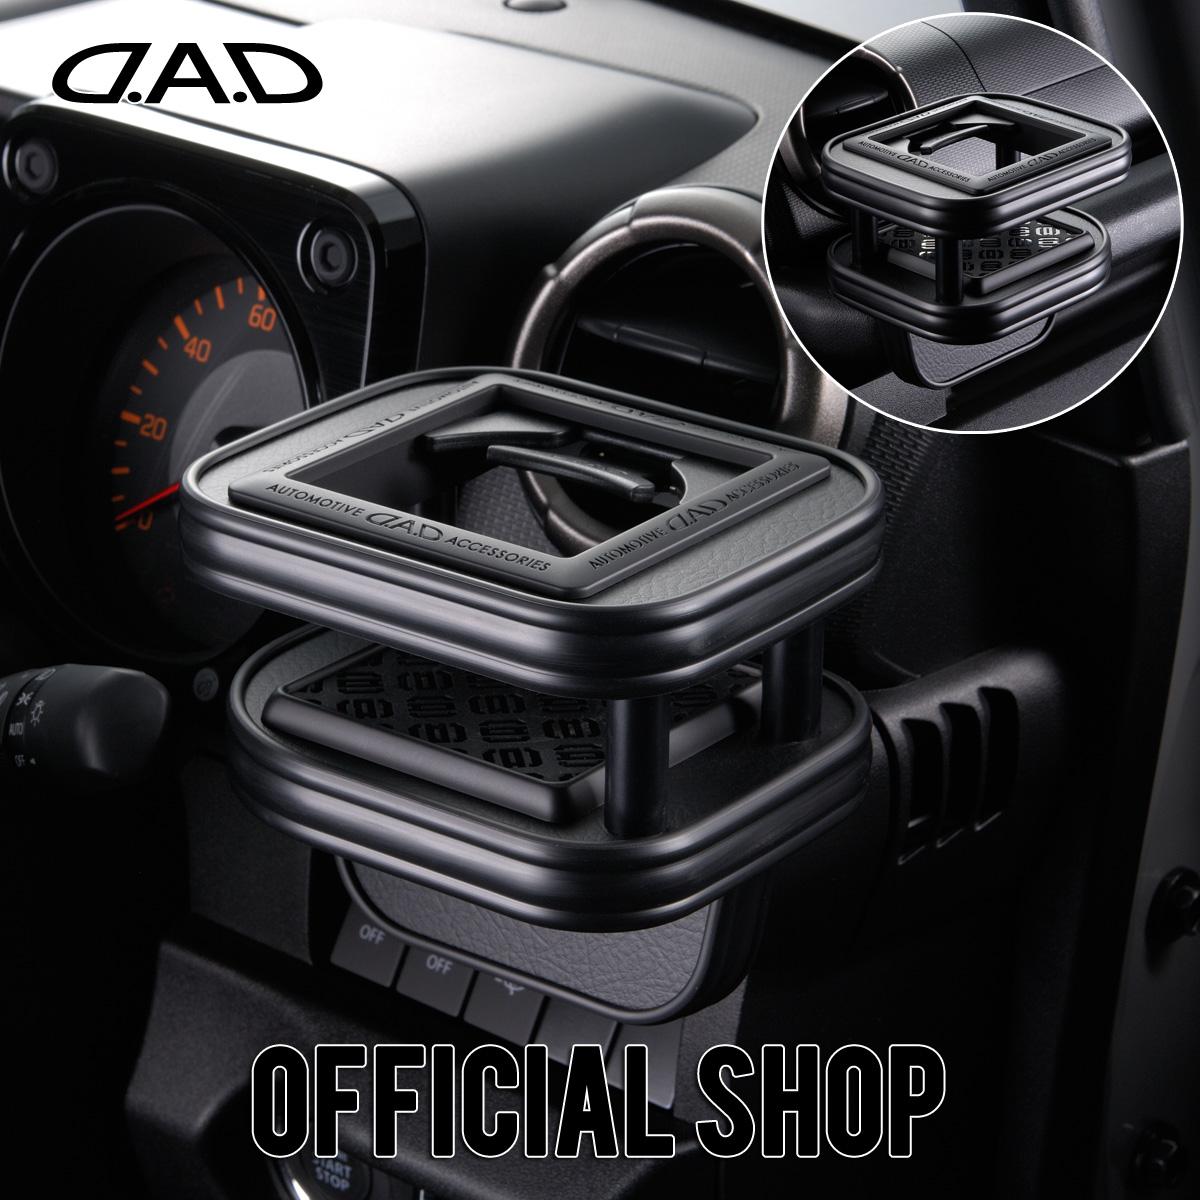 DAD ギャルソン D.A.D フロントドリンクホルダー for JB64 ジムニー / JB74 シエラ専用 運転席側用 / 助手席側用 [DV541/DV542] GARSON